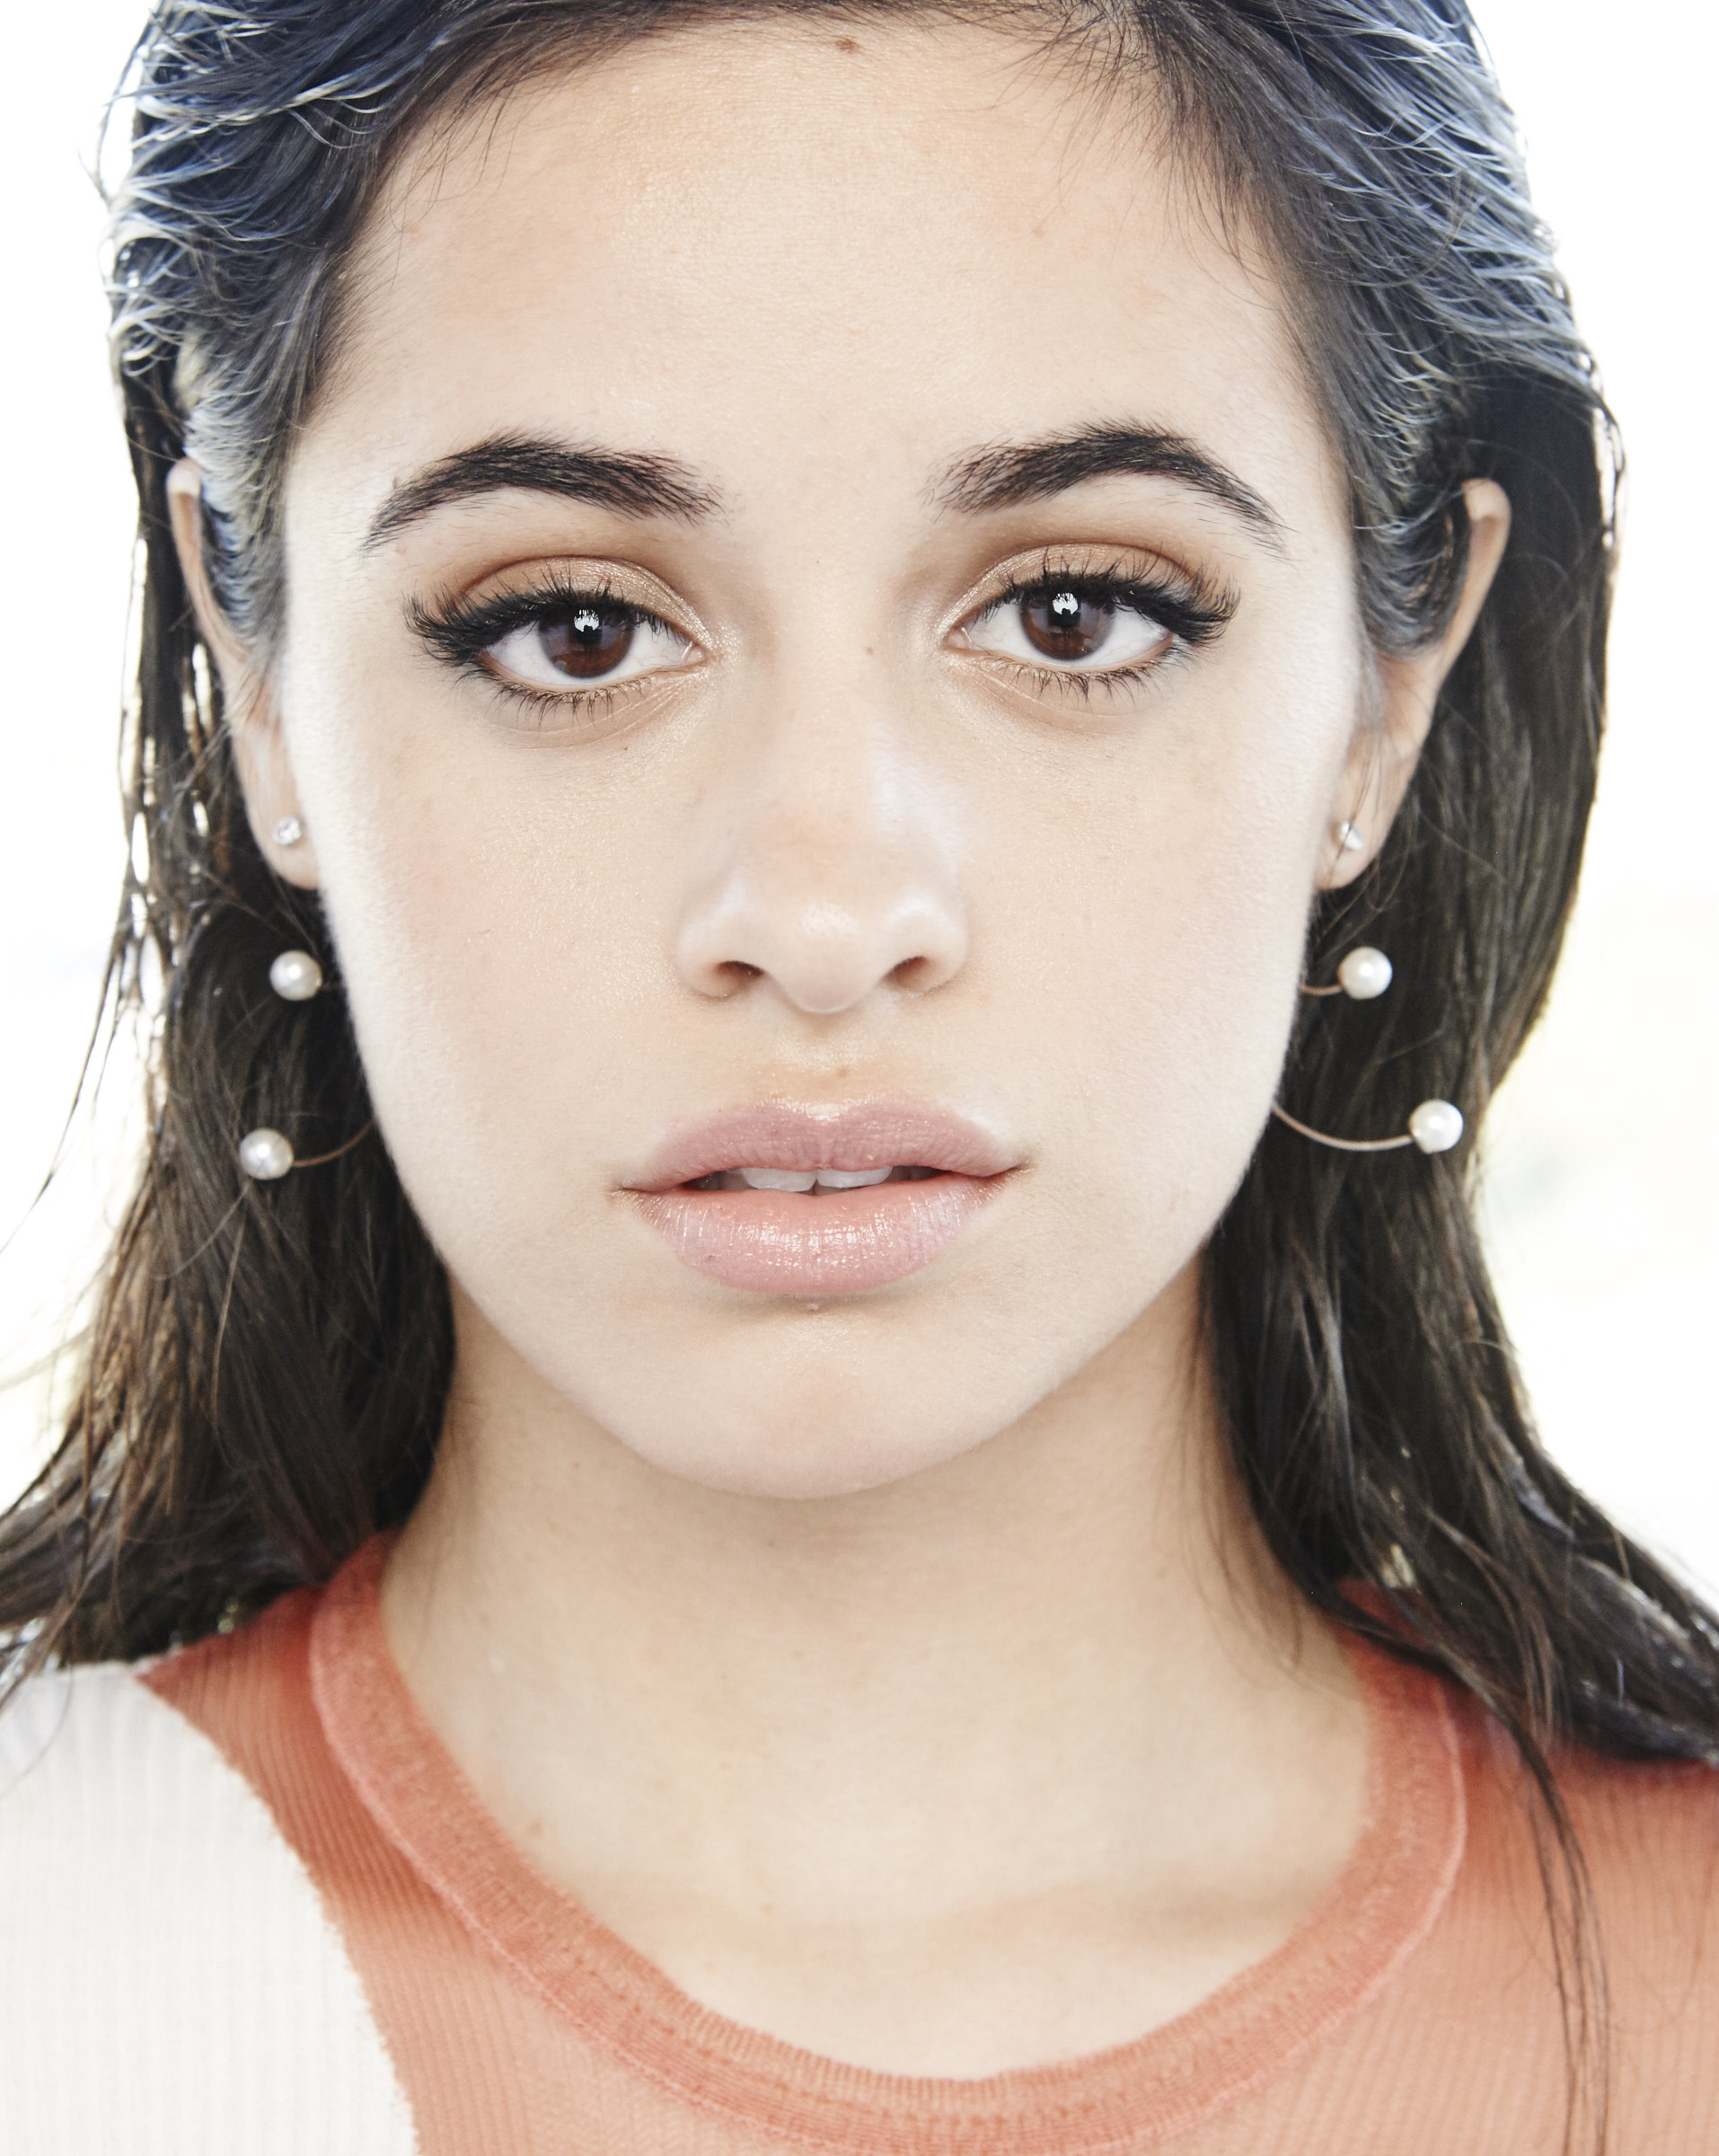 Camila for Fashion Magazine (2016)